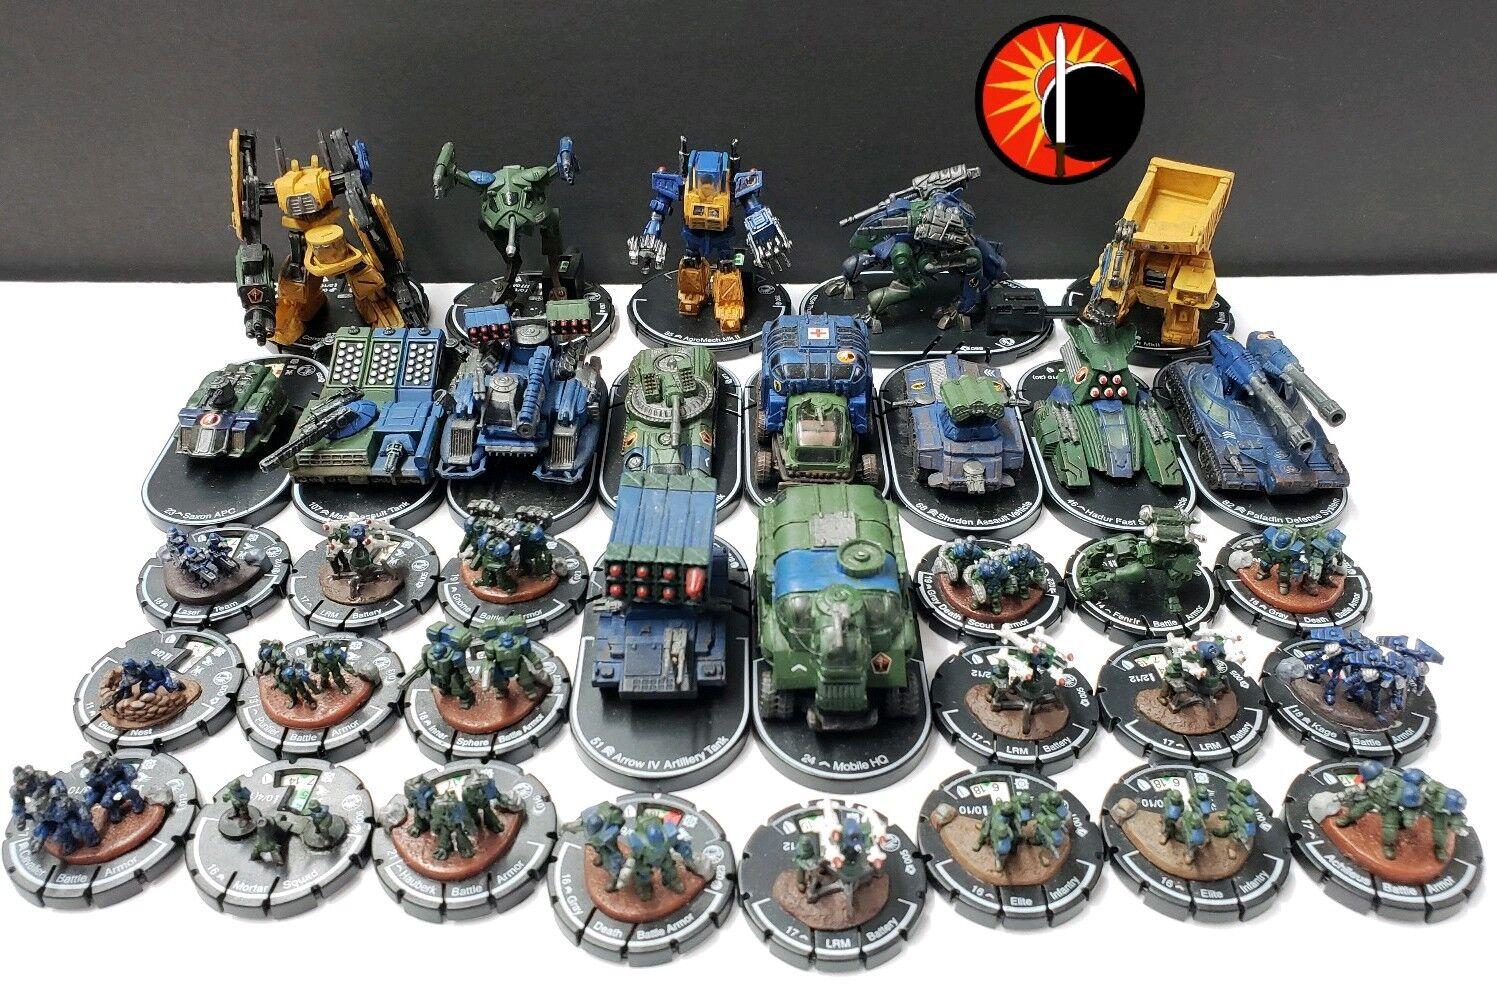 B5 MechWarrior (Wizbambini) Lot - Mechs Vehicles Infantry - Swordsworn  Clan Fazione  saldi